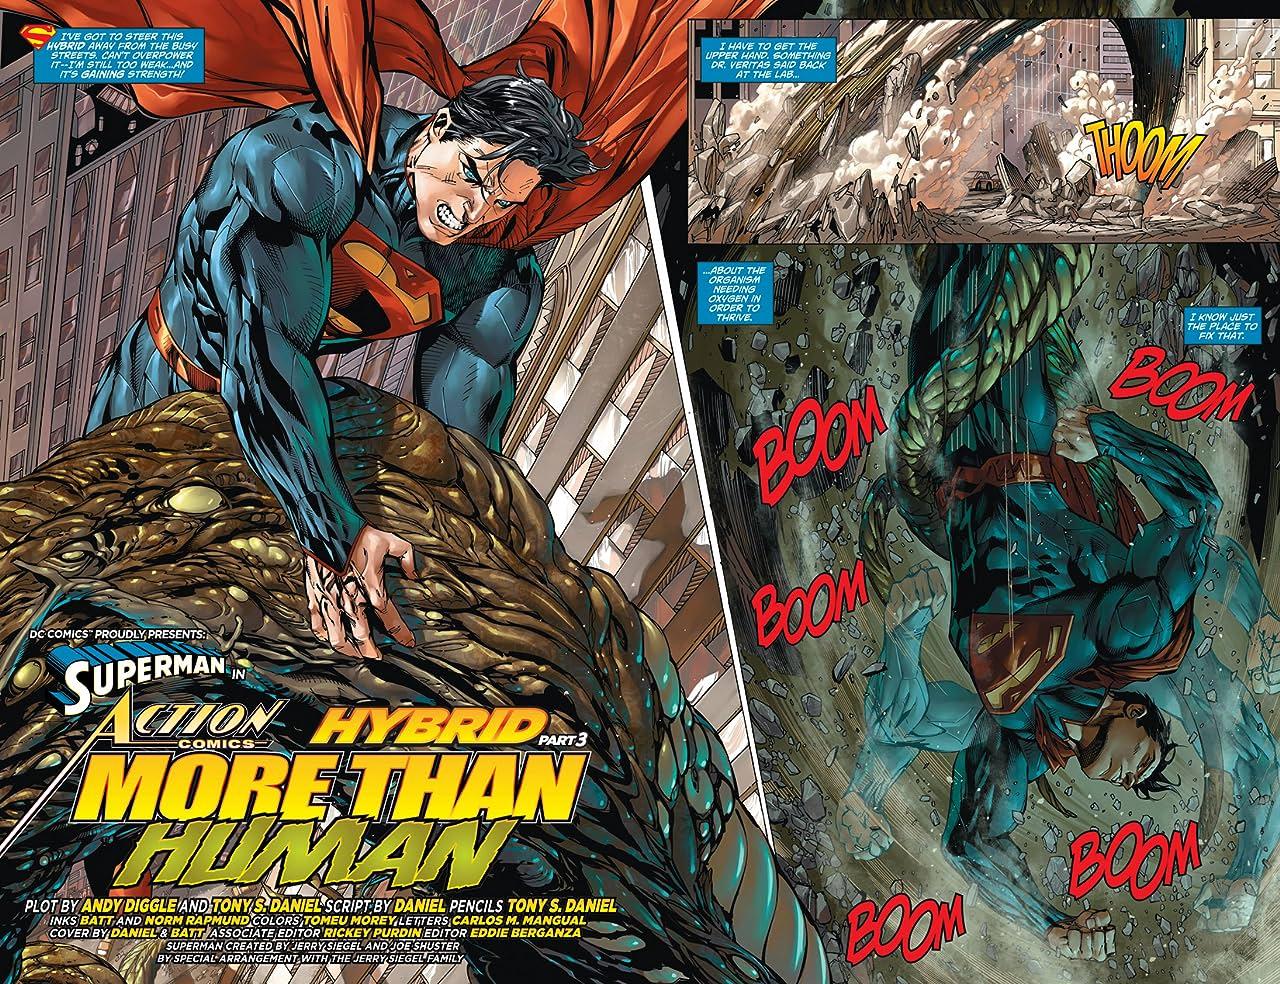 Action Comics (2011-) #21